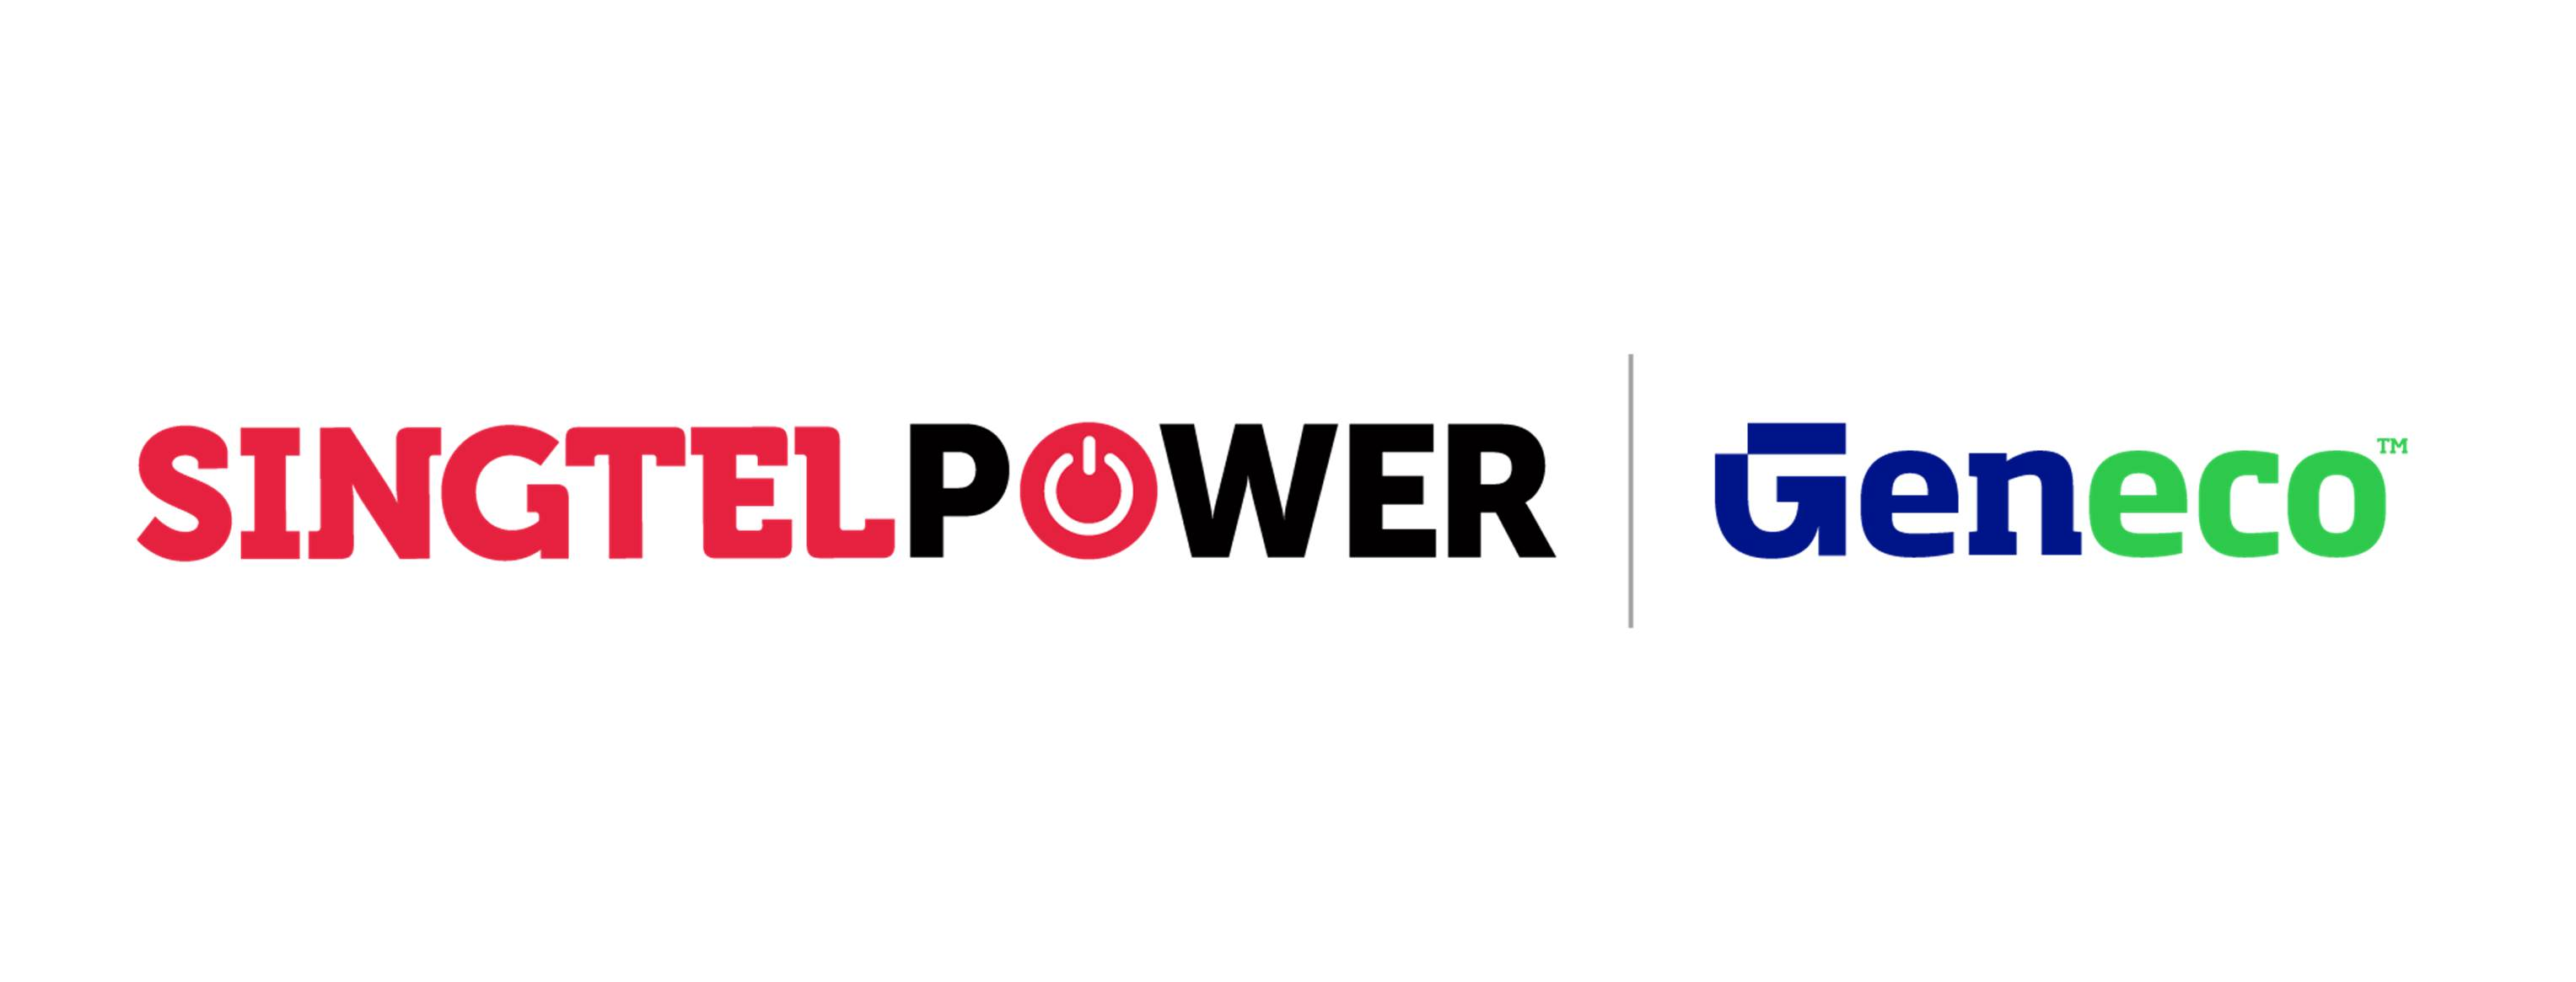 Singtel Power Geneco